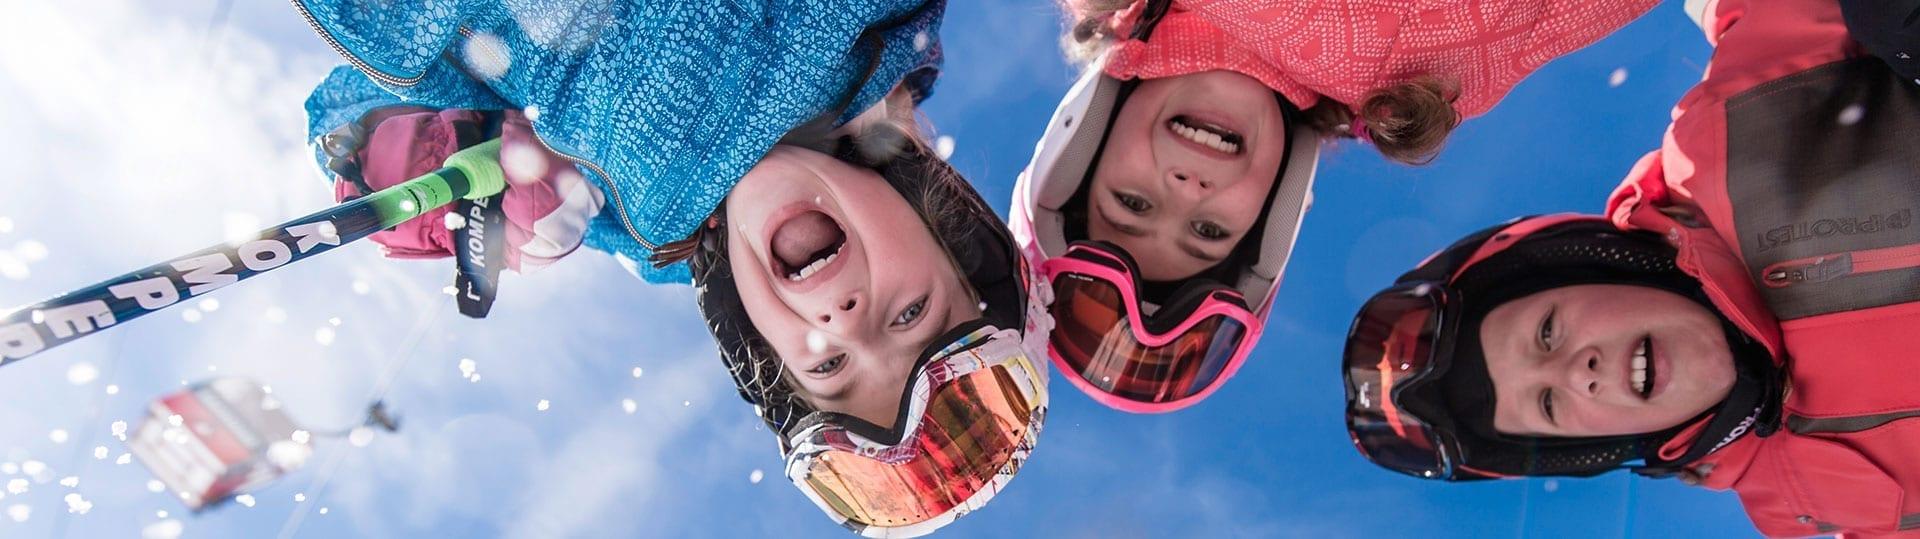 Familien-Skiurlaub in Ski amadé